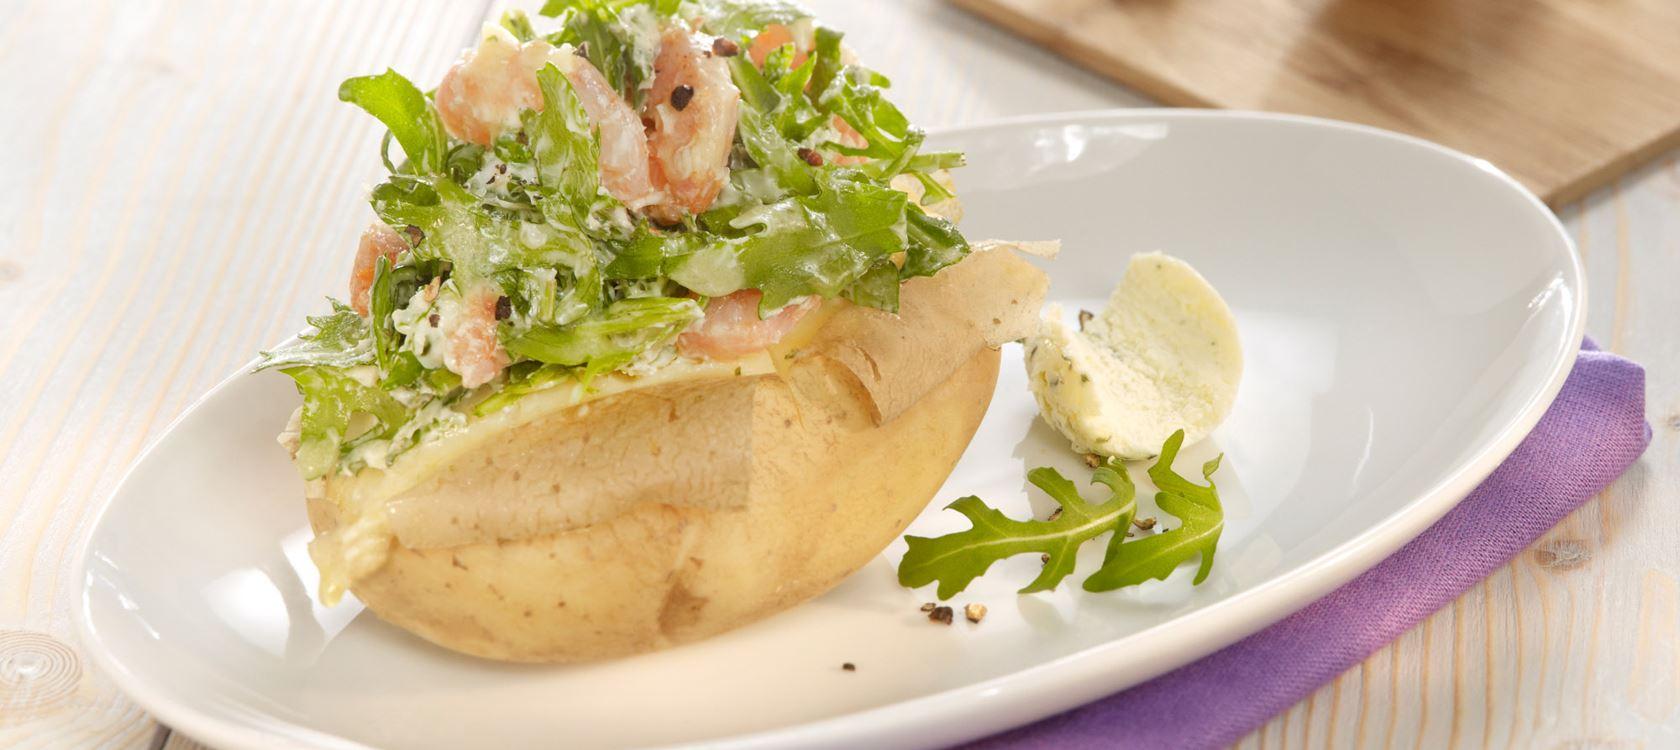 Pikante Ofenkartoffeln mit Arla Kærgården®